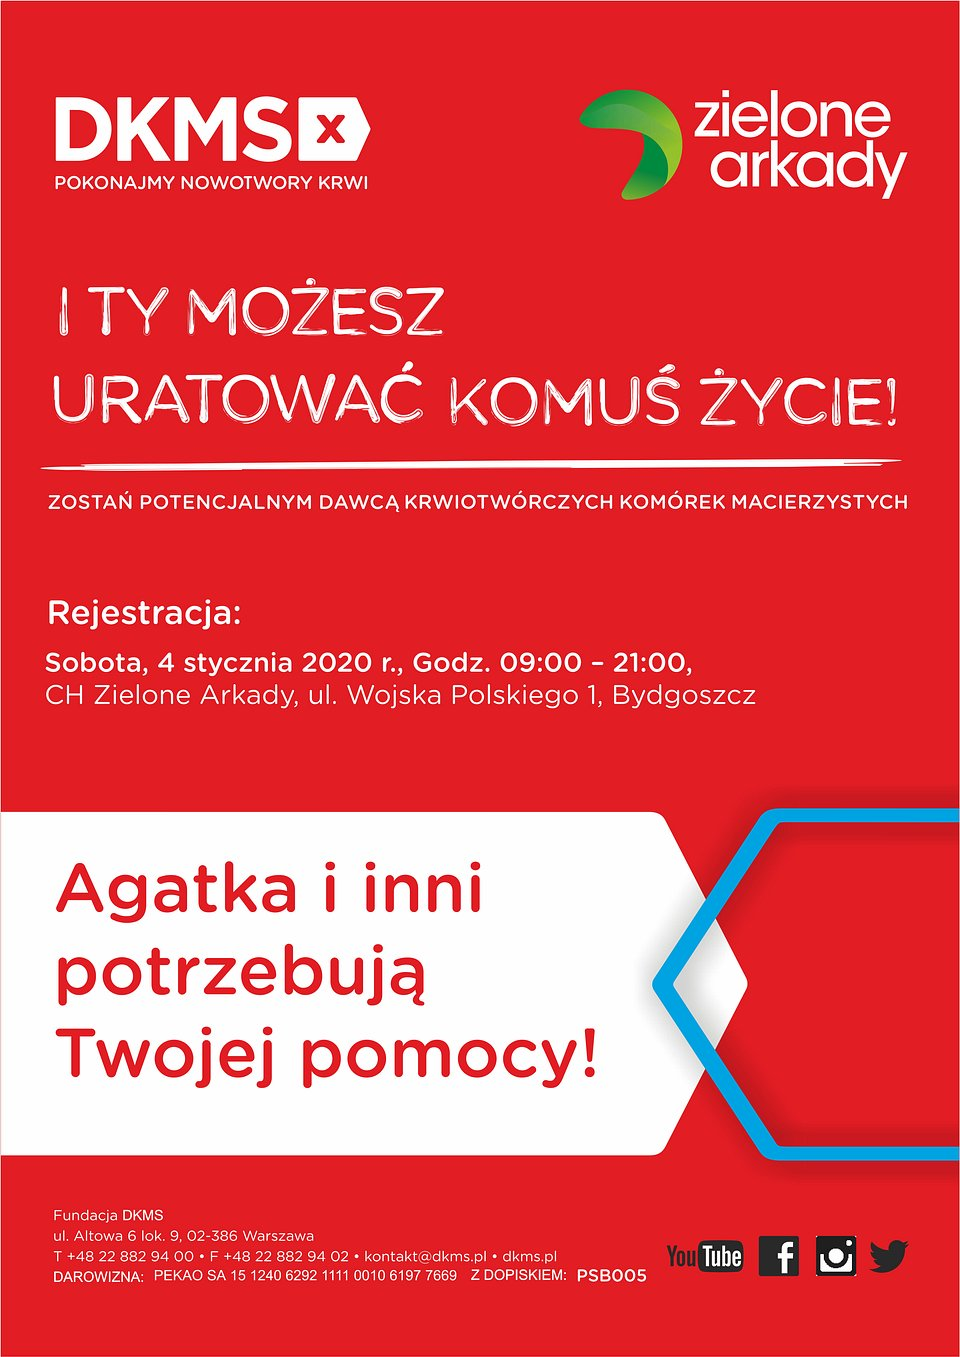 DKMS w Zielonych Arkadach_plakat.jpg